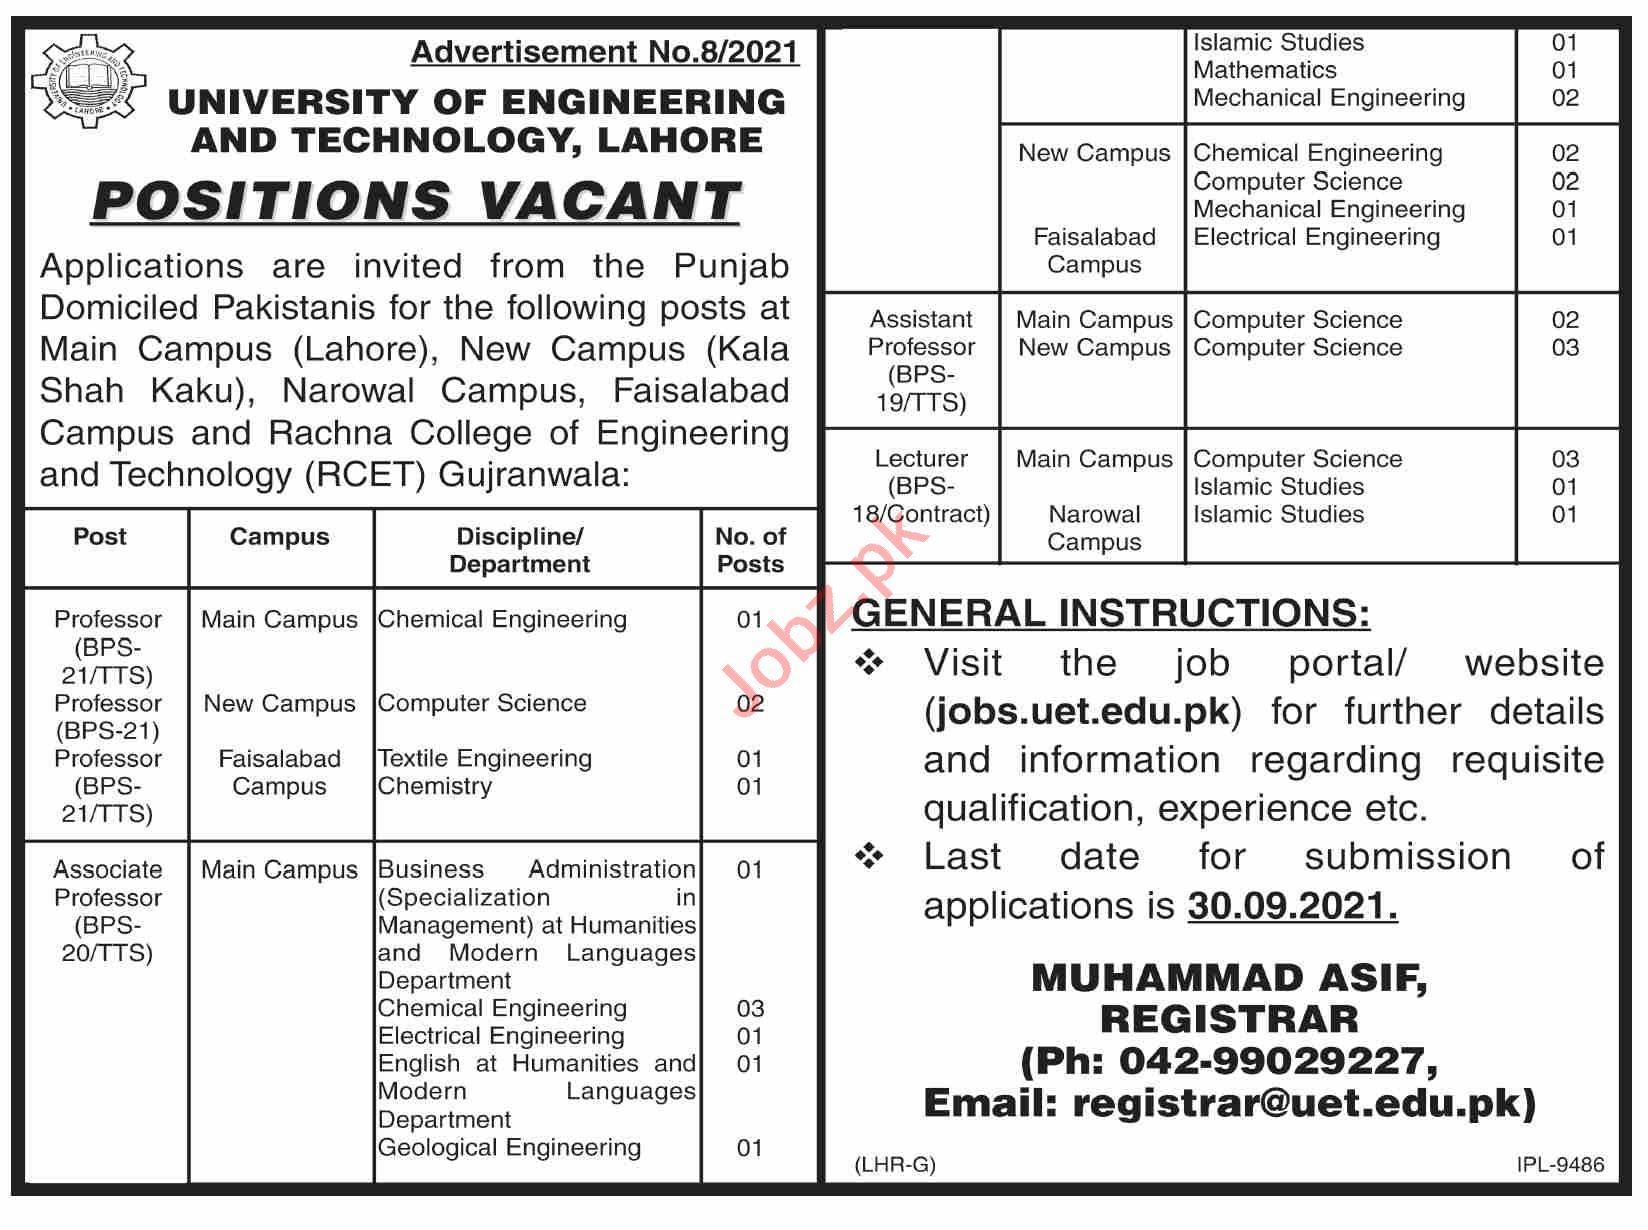 Rachna College of Engineering & Technology Gujranwala Jobs